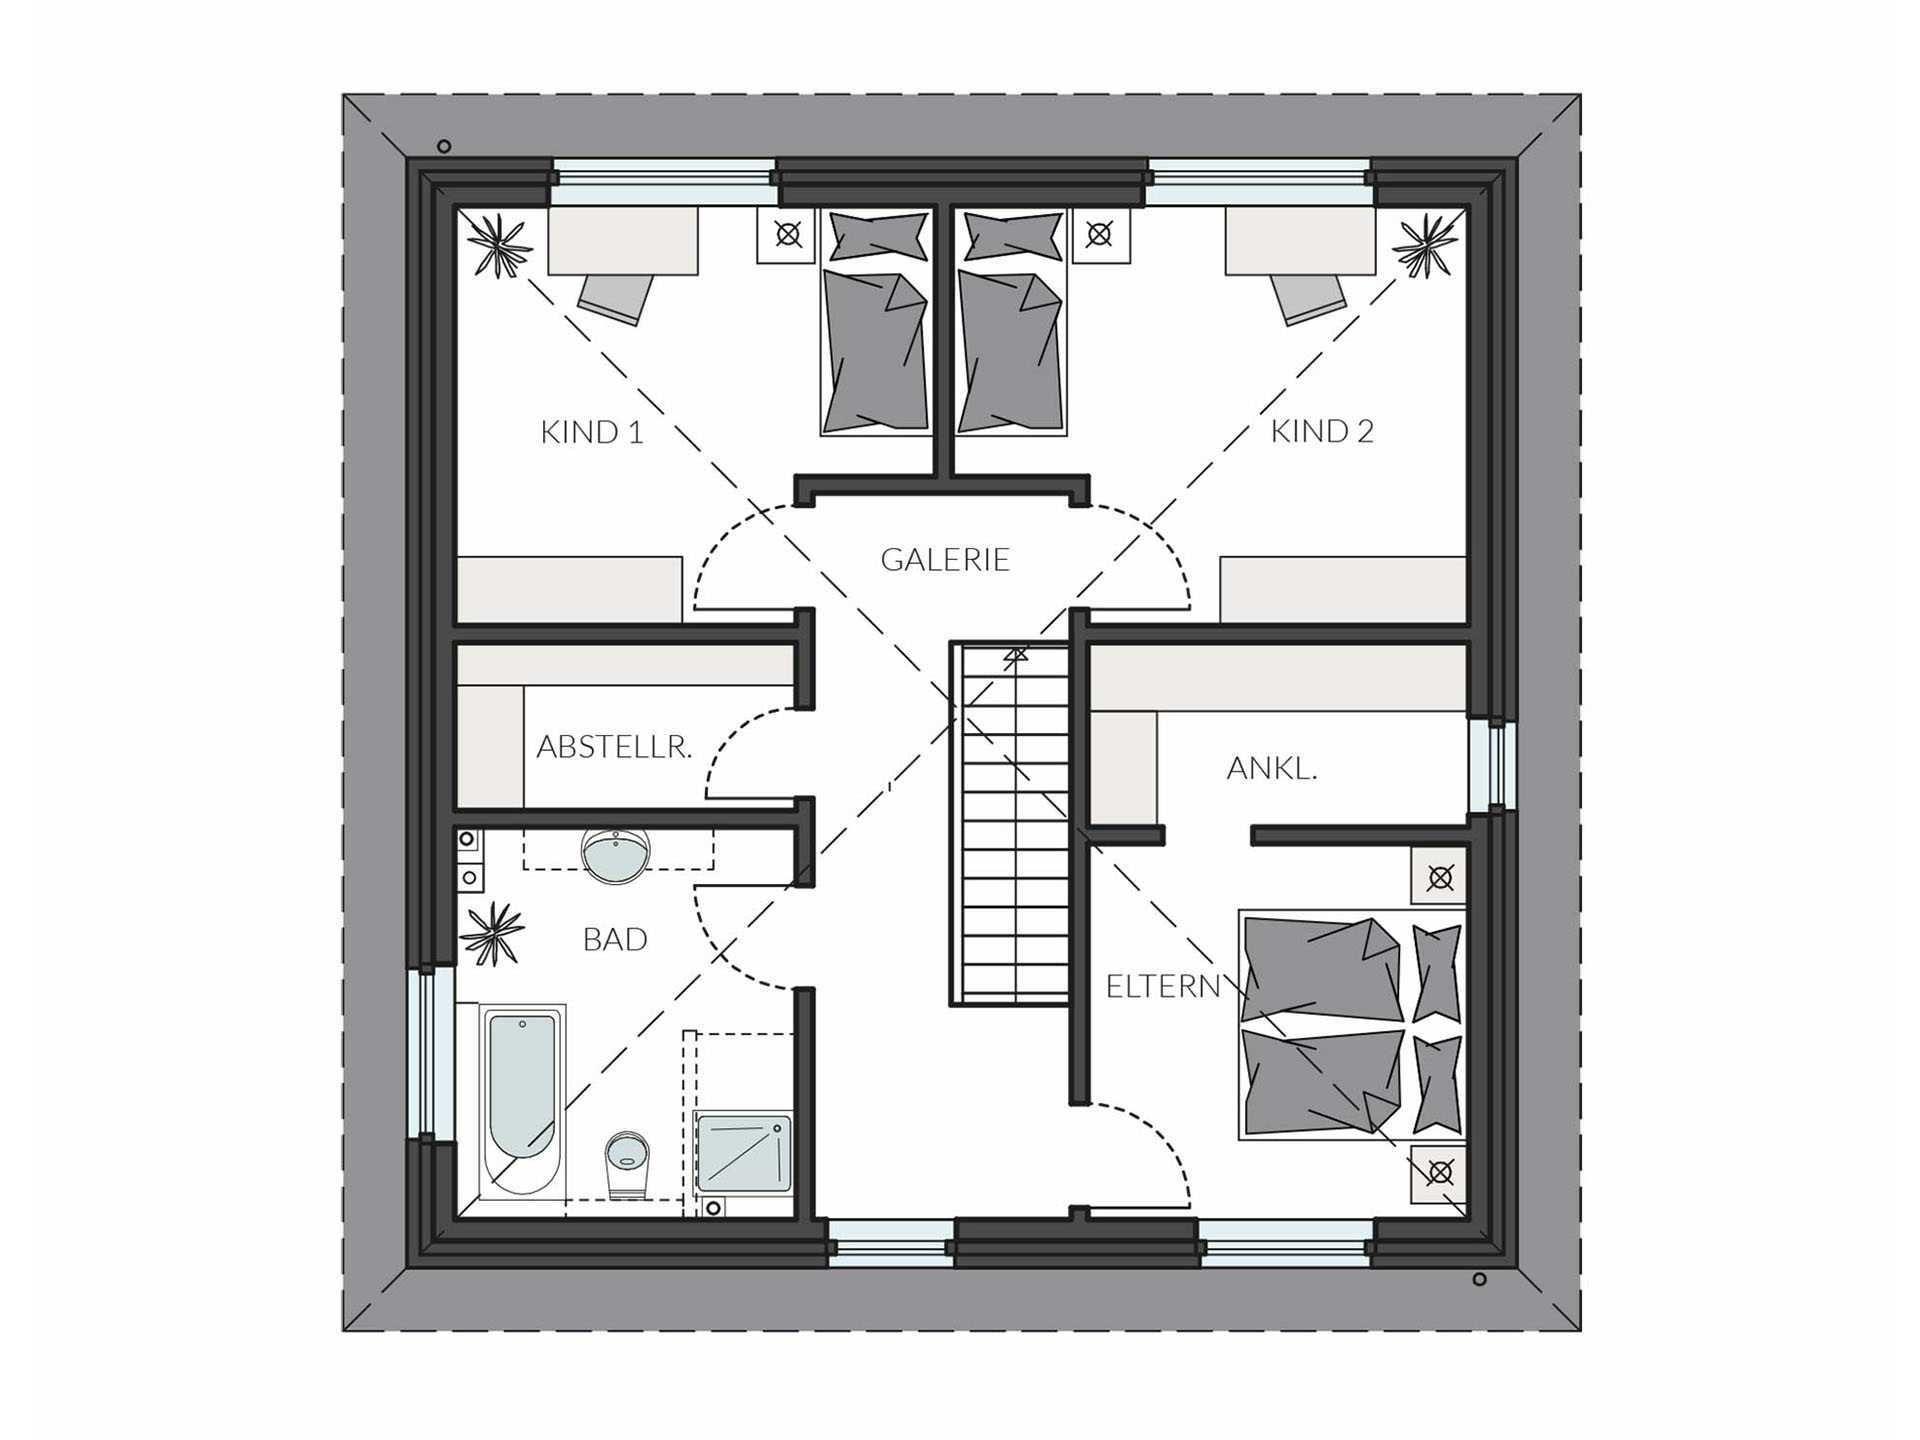 Haus CityLife 600 WeberHaus Planimetrie di case